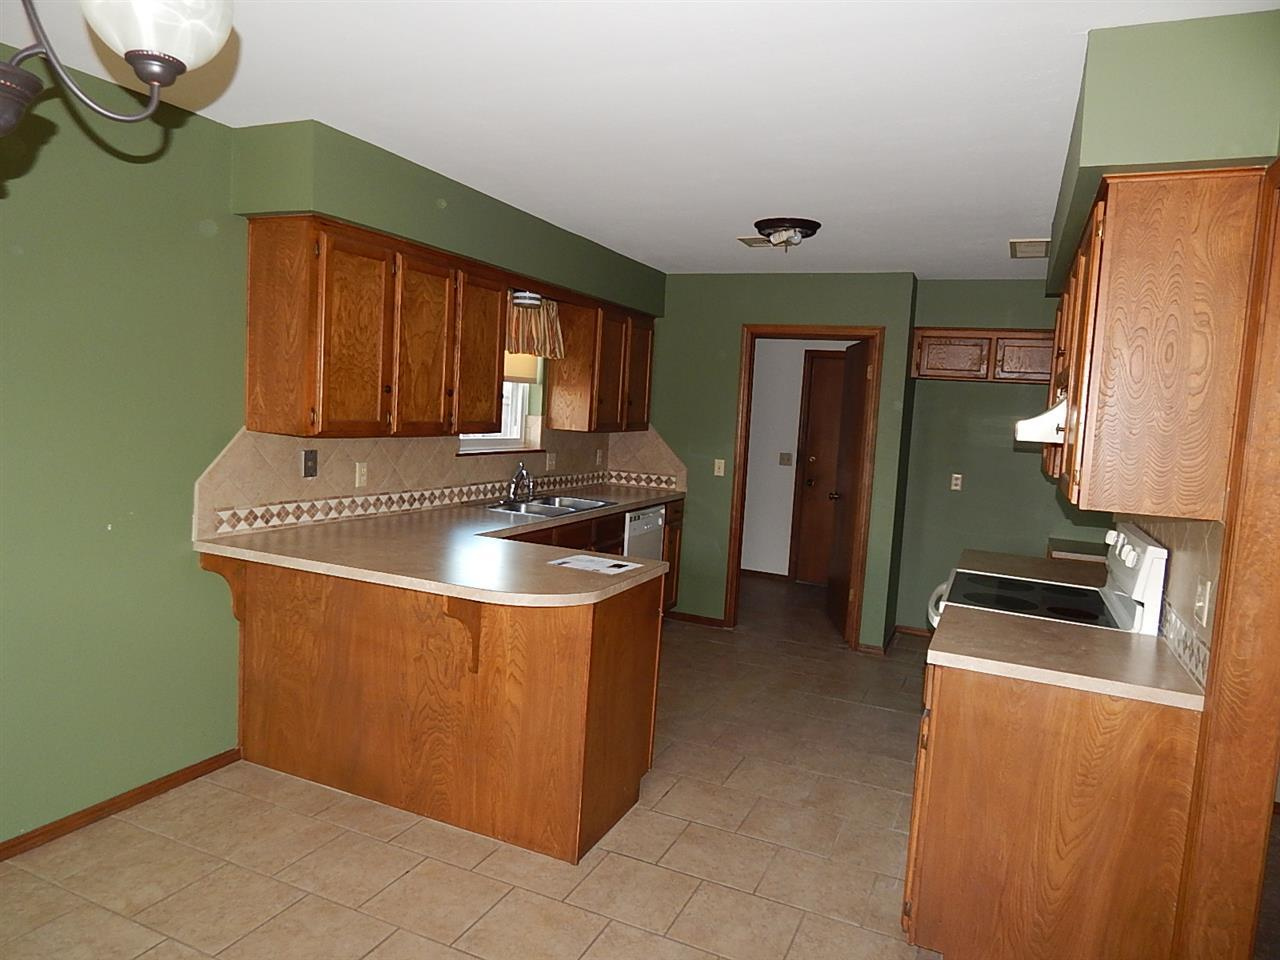 Sold Cross Sale W/ MLS | 2312 Calvert Ponca City, OK 74601 6